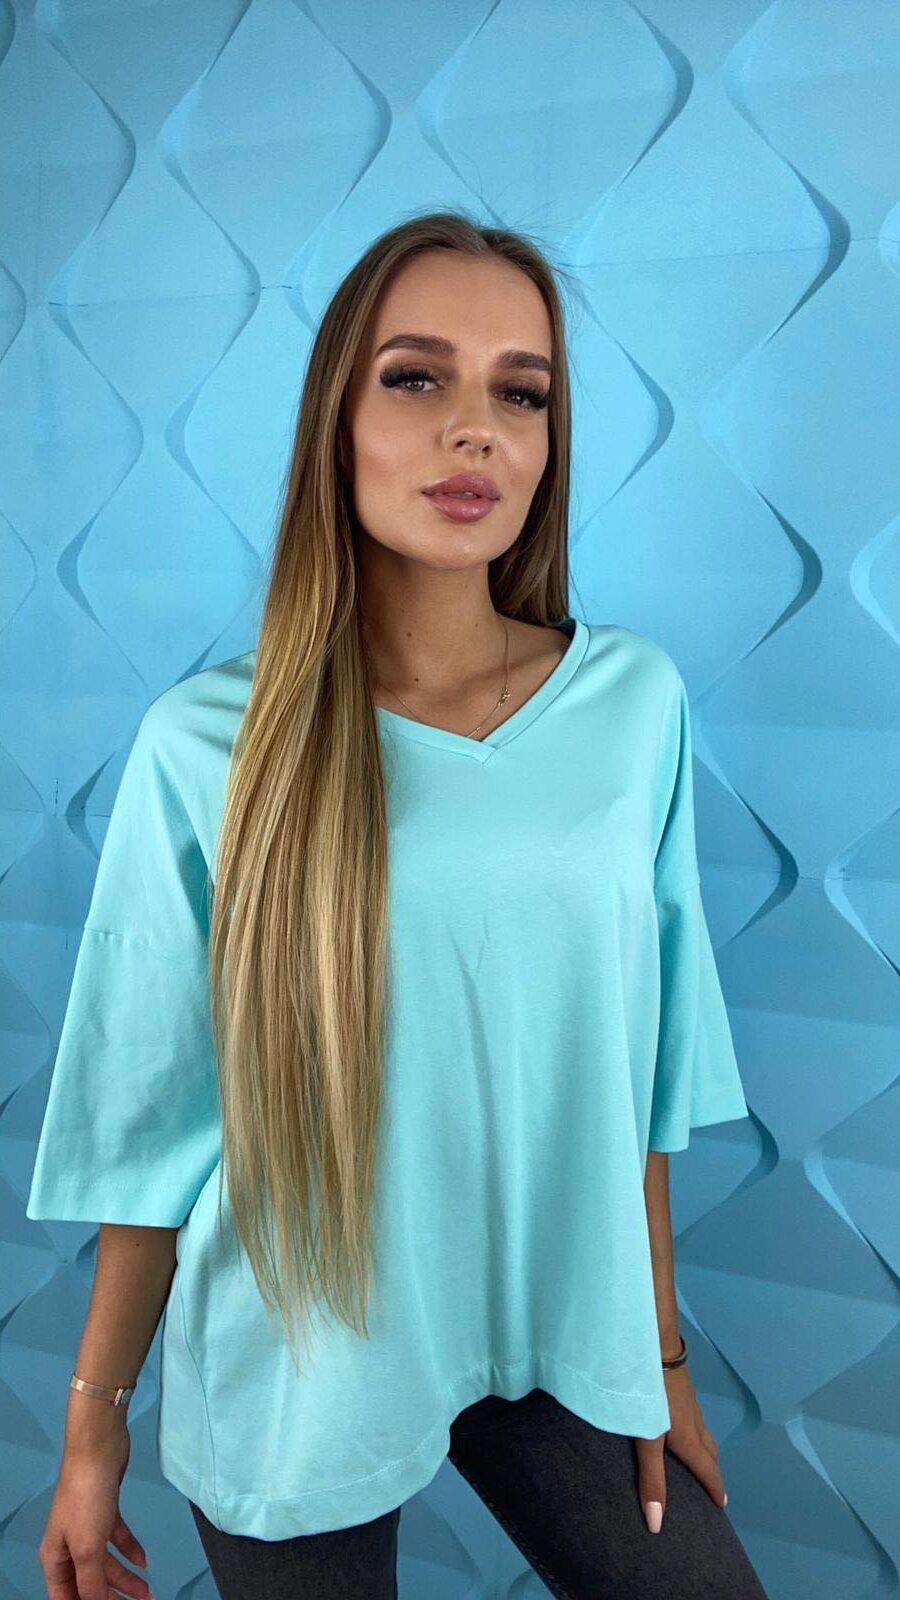 koszulki tshirty damskie duze rozmiary blekit2